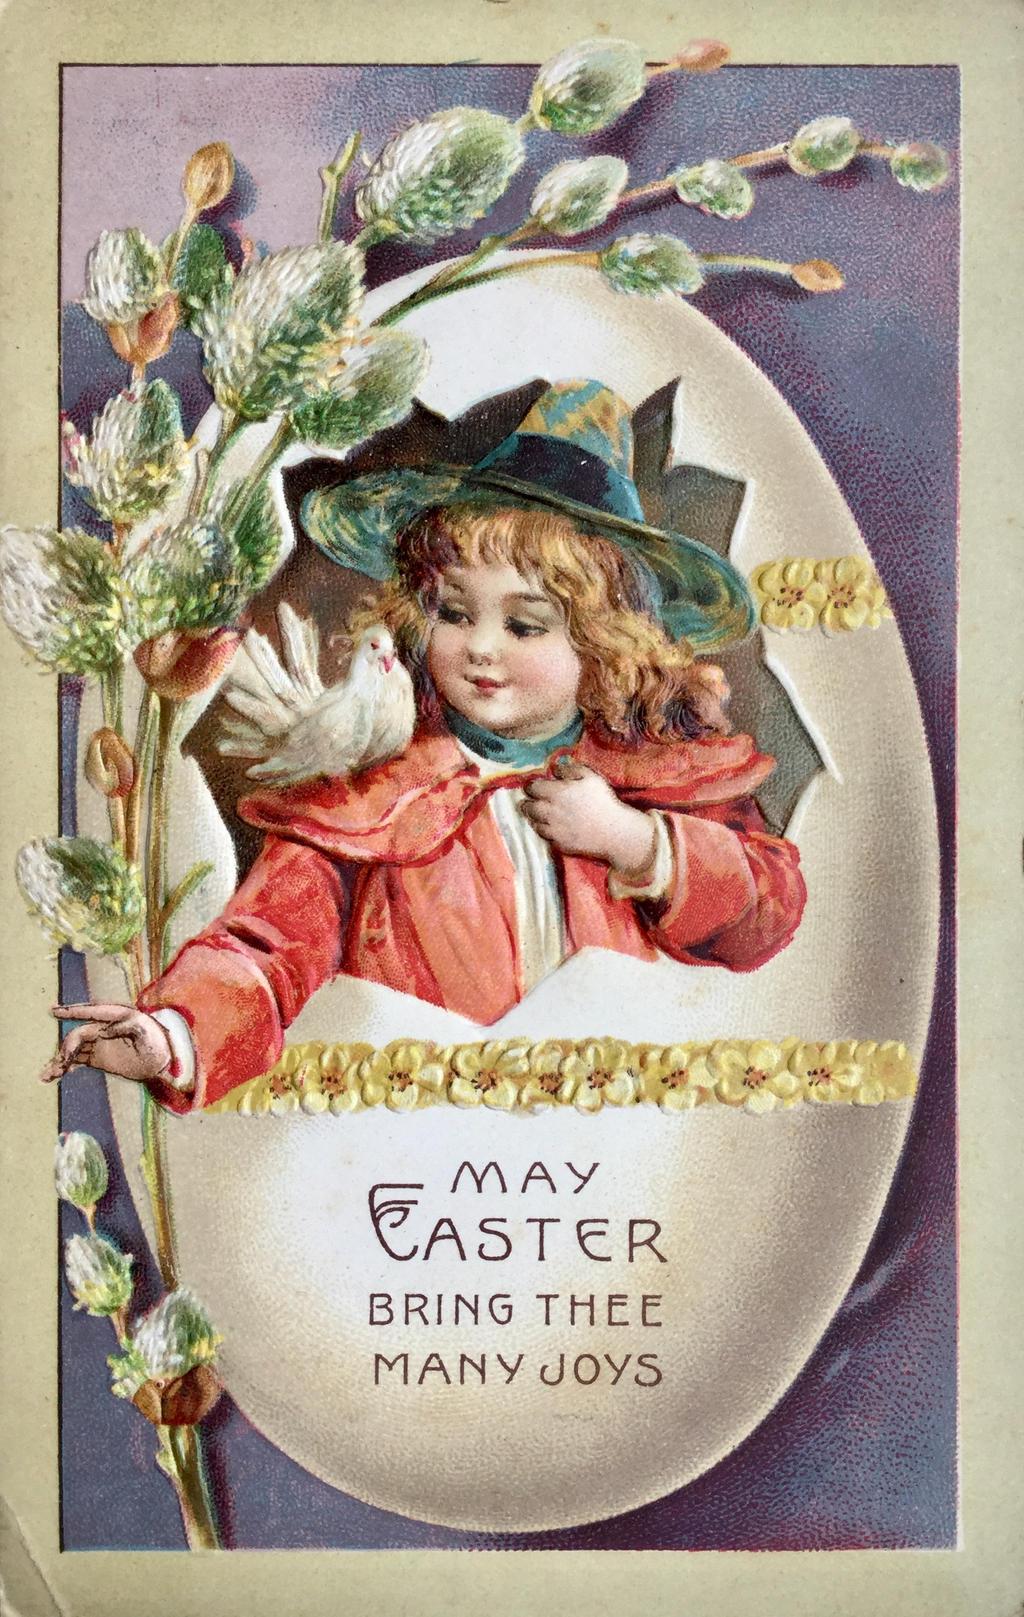 Easter Brings Many Joys